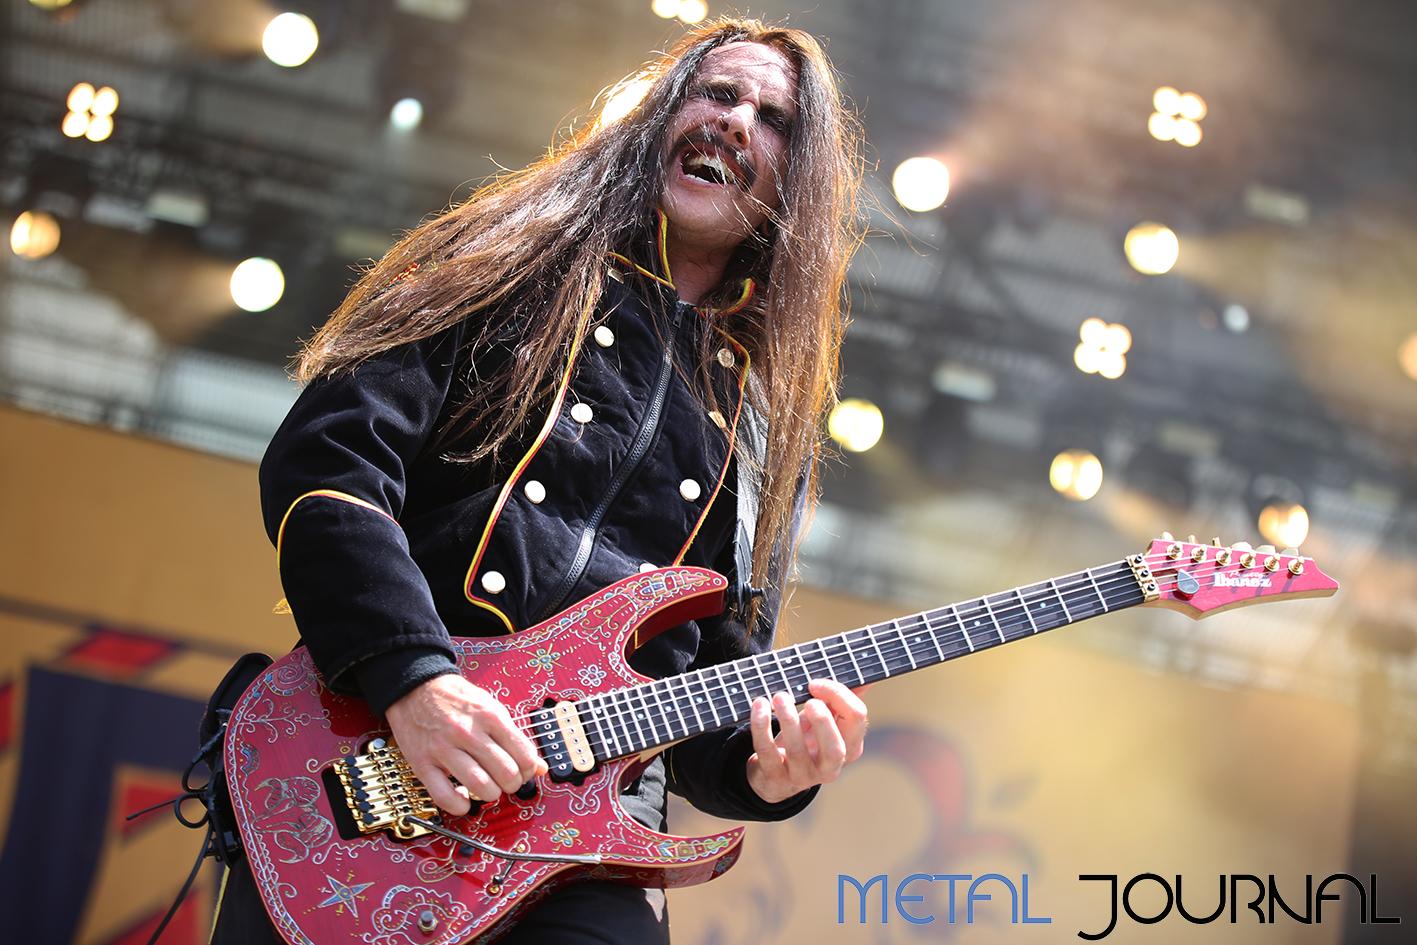 avatar - metal journal rock fest barcelona 2019 pic 3